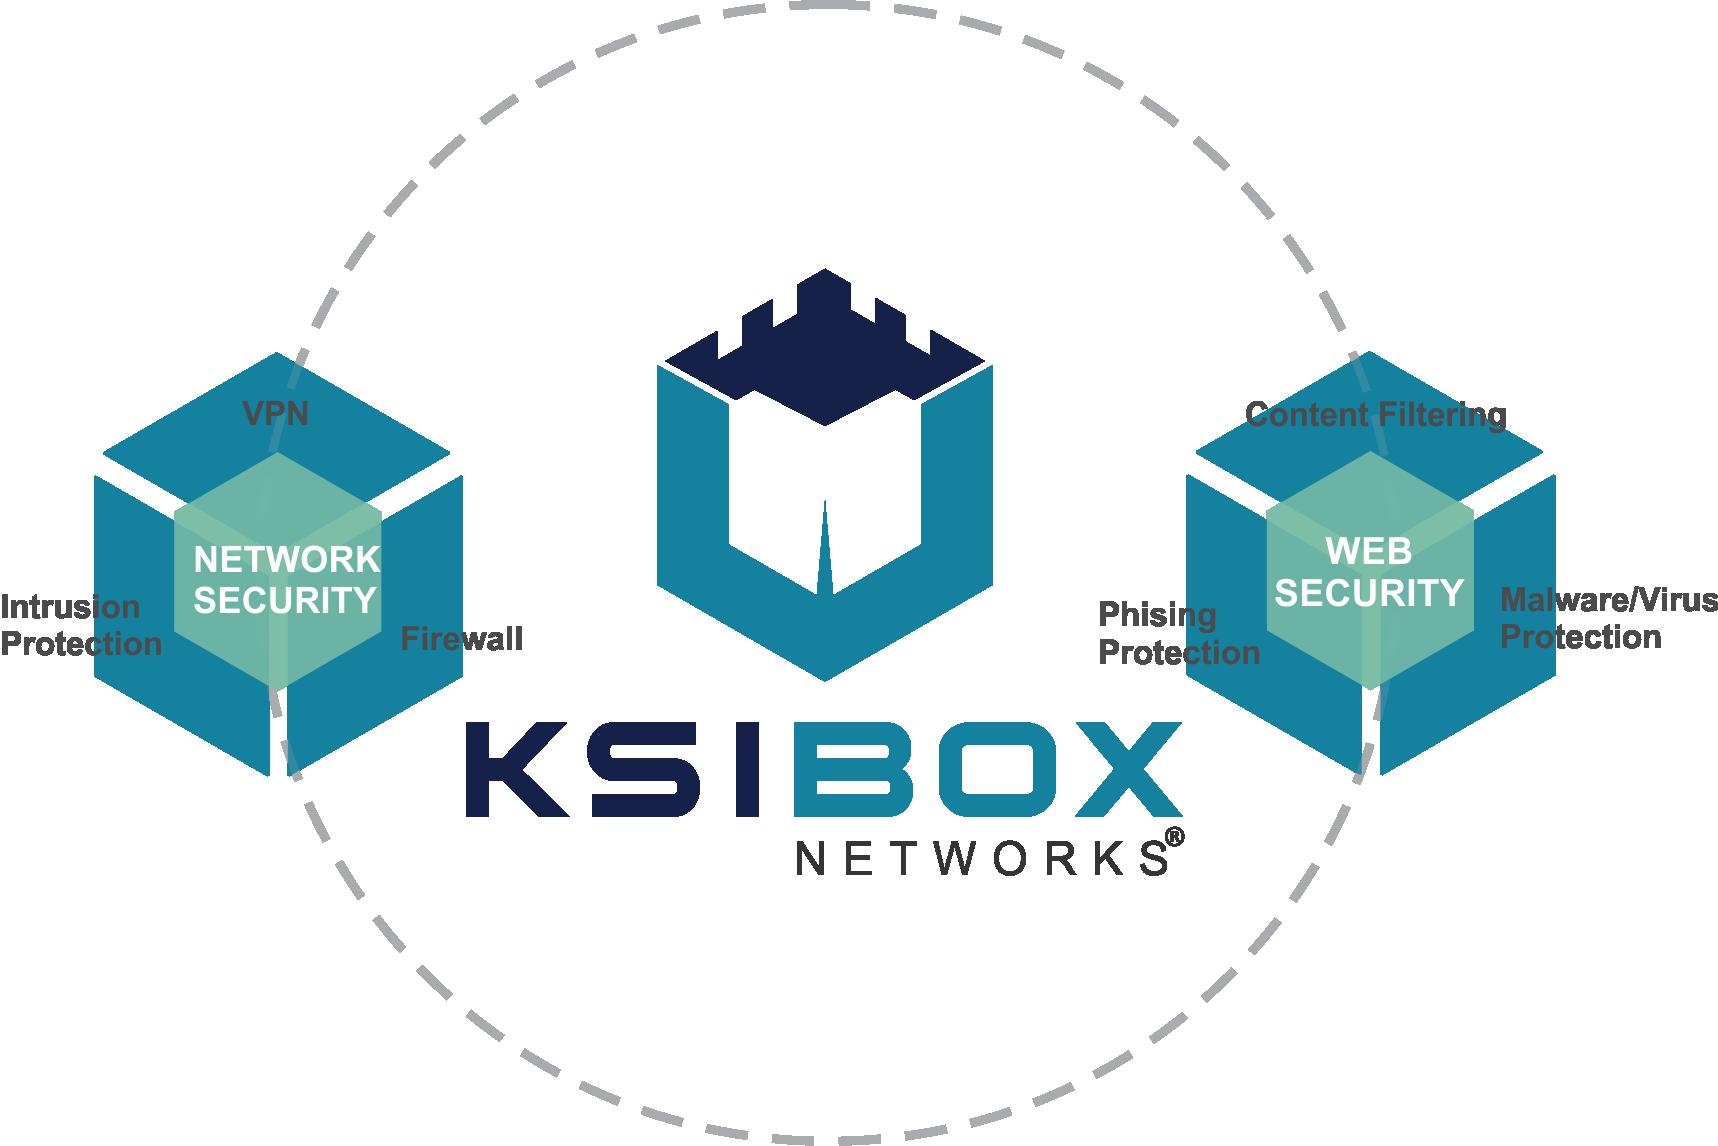 ksibox